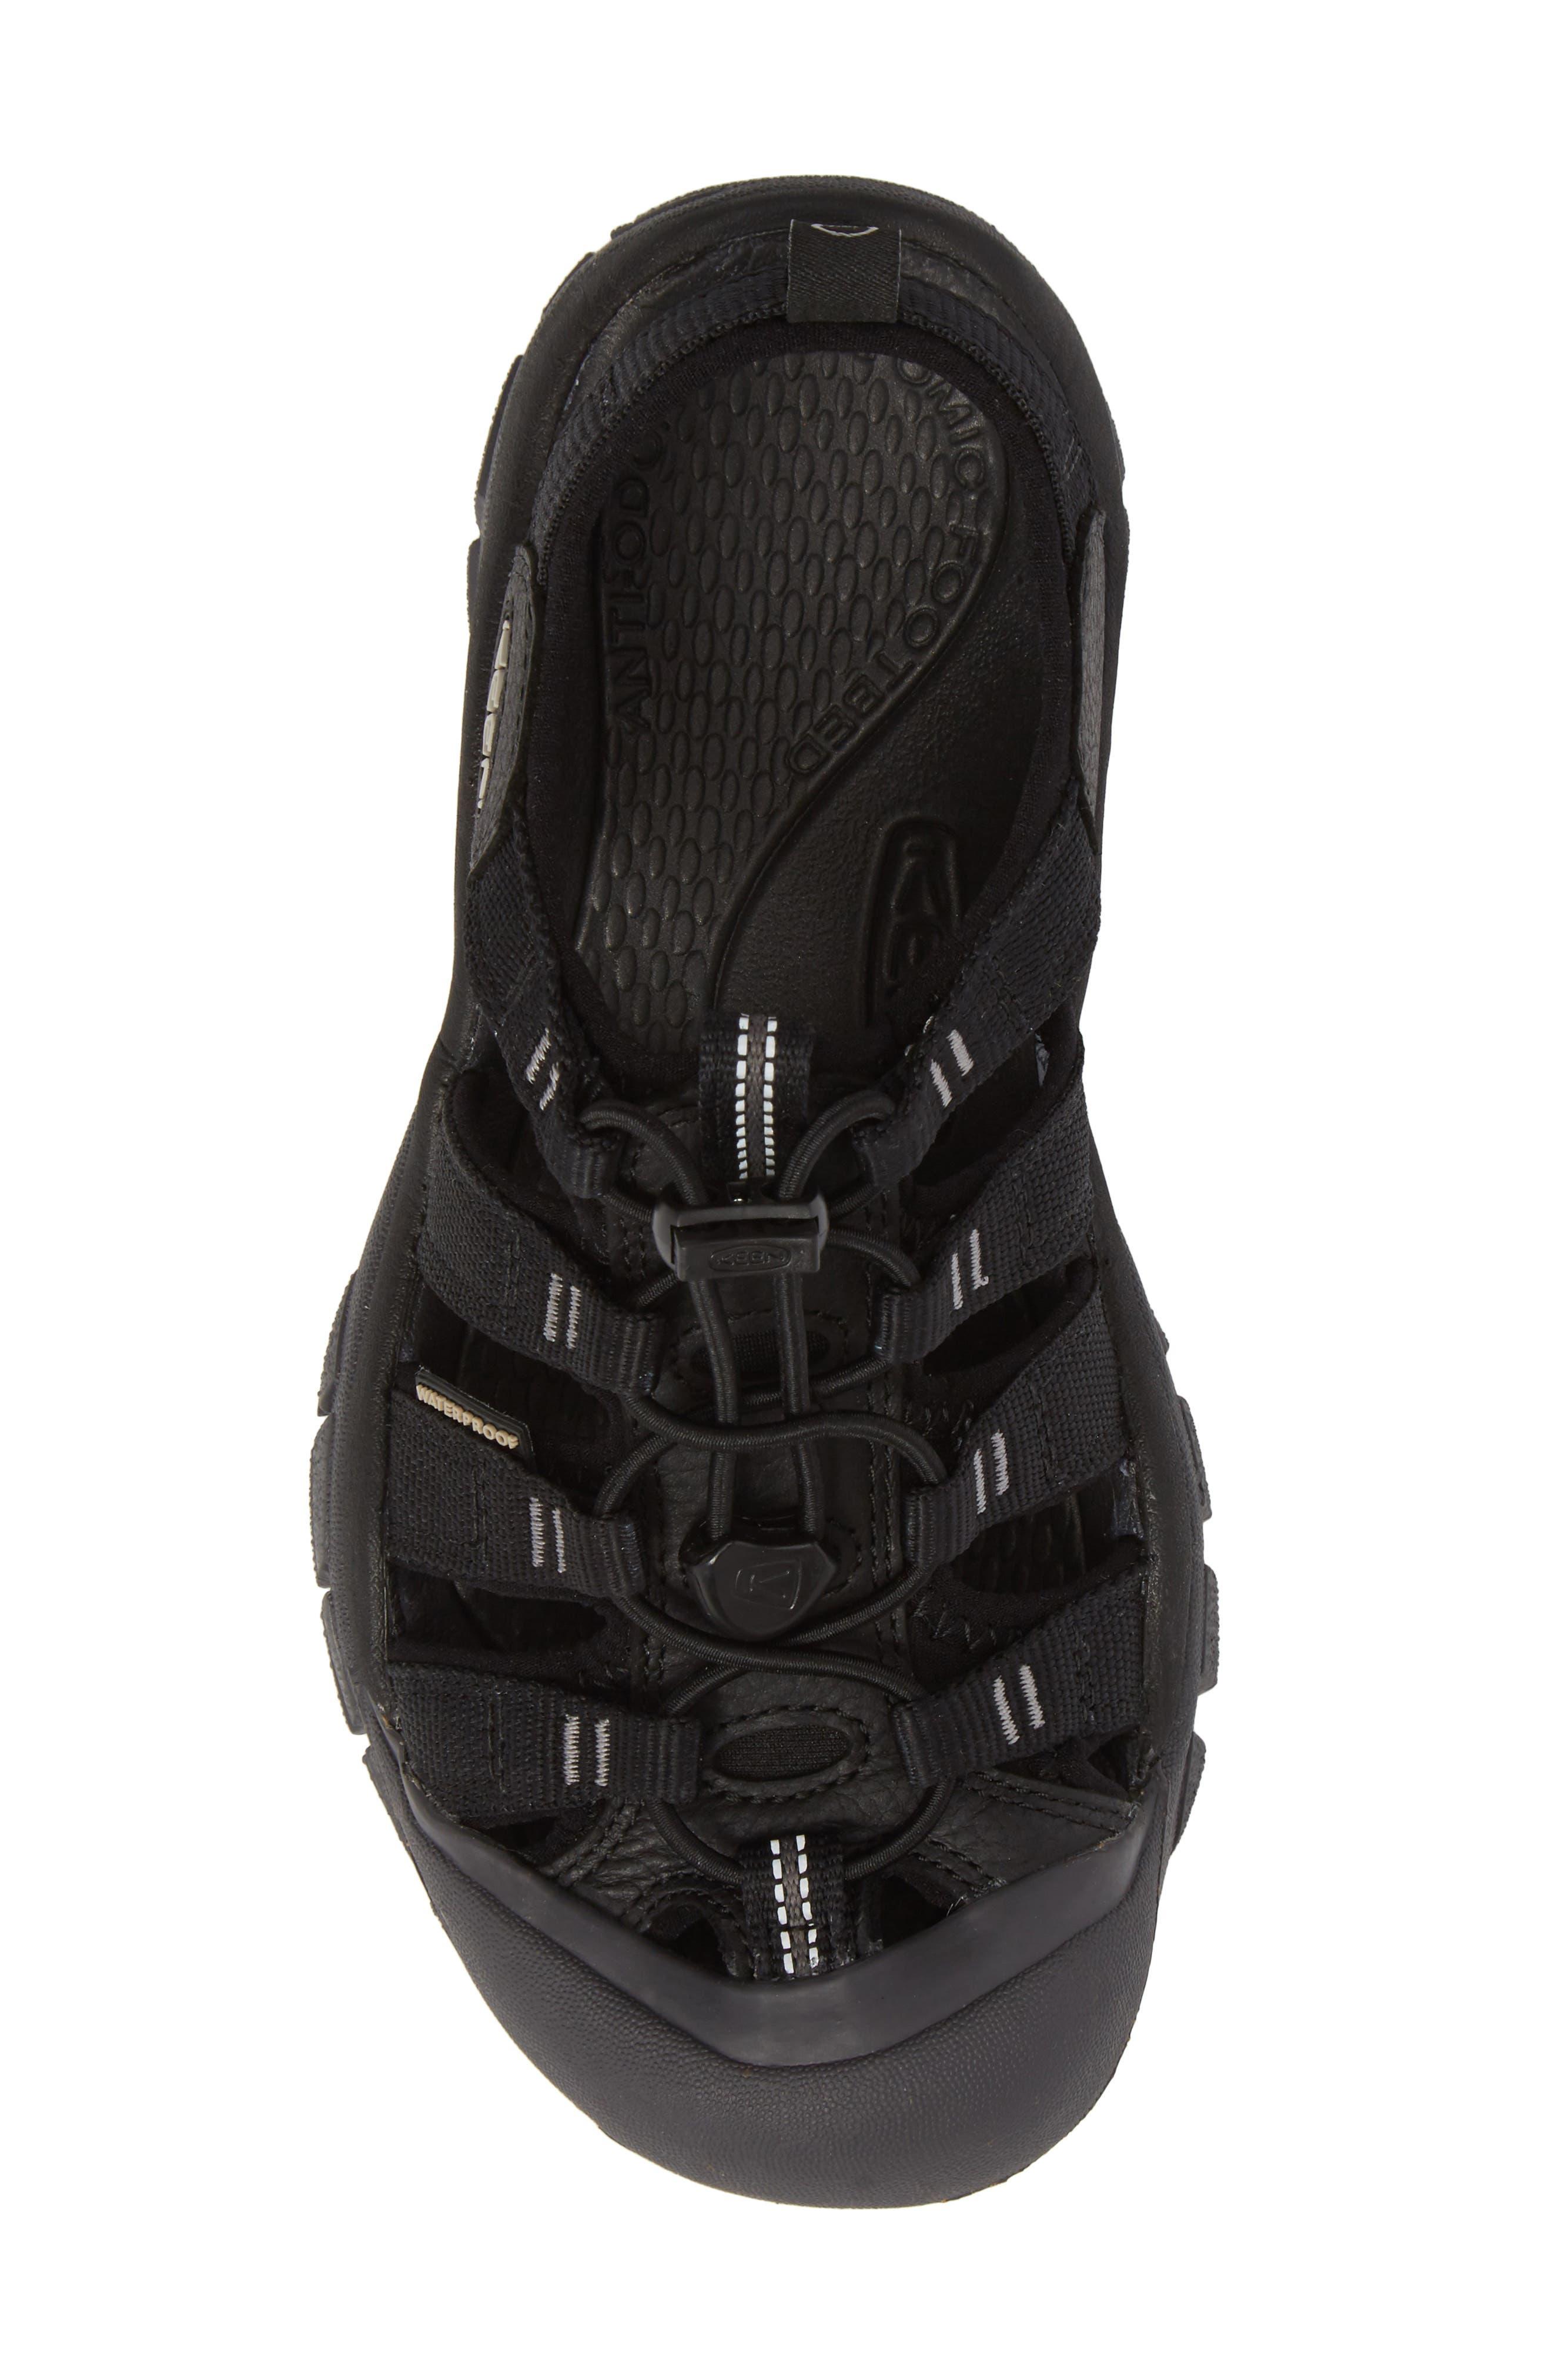 KEEN,                             Newport Eco Waterproof Sandal,                             Alternate thumbnail 5, color,                             007